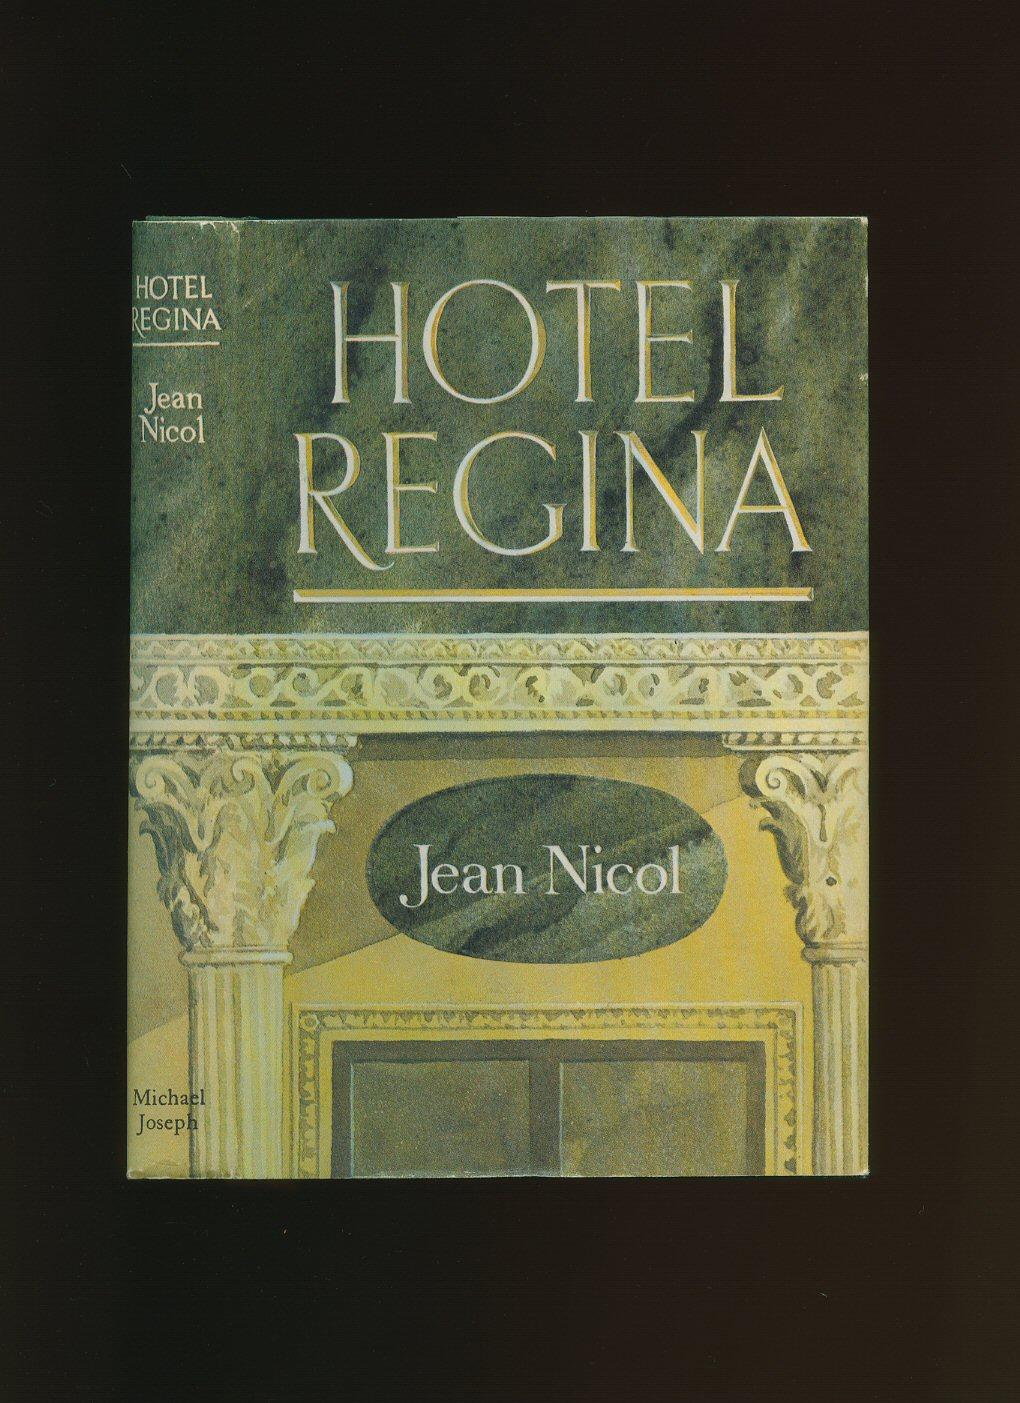 NICOL, JEAN - Hotel Regina